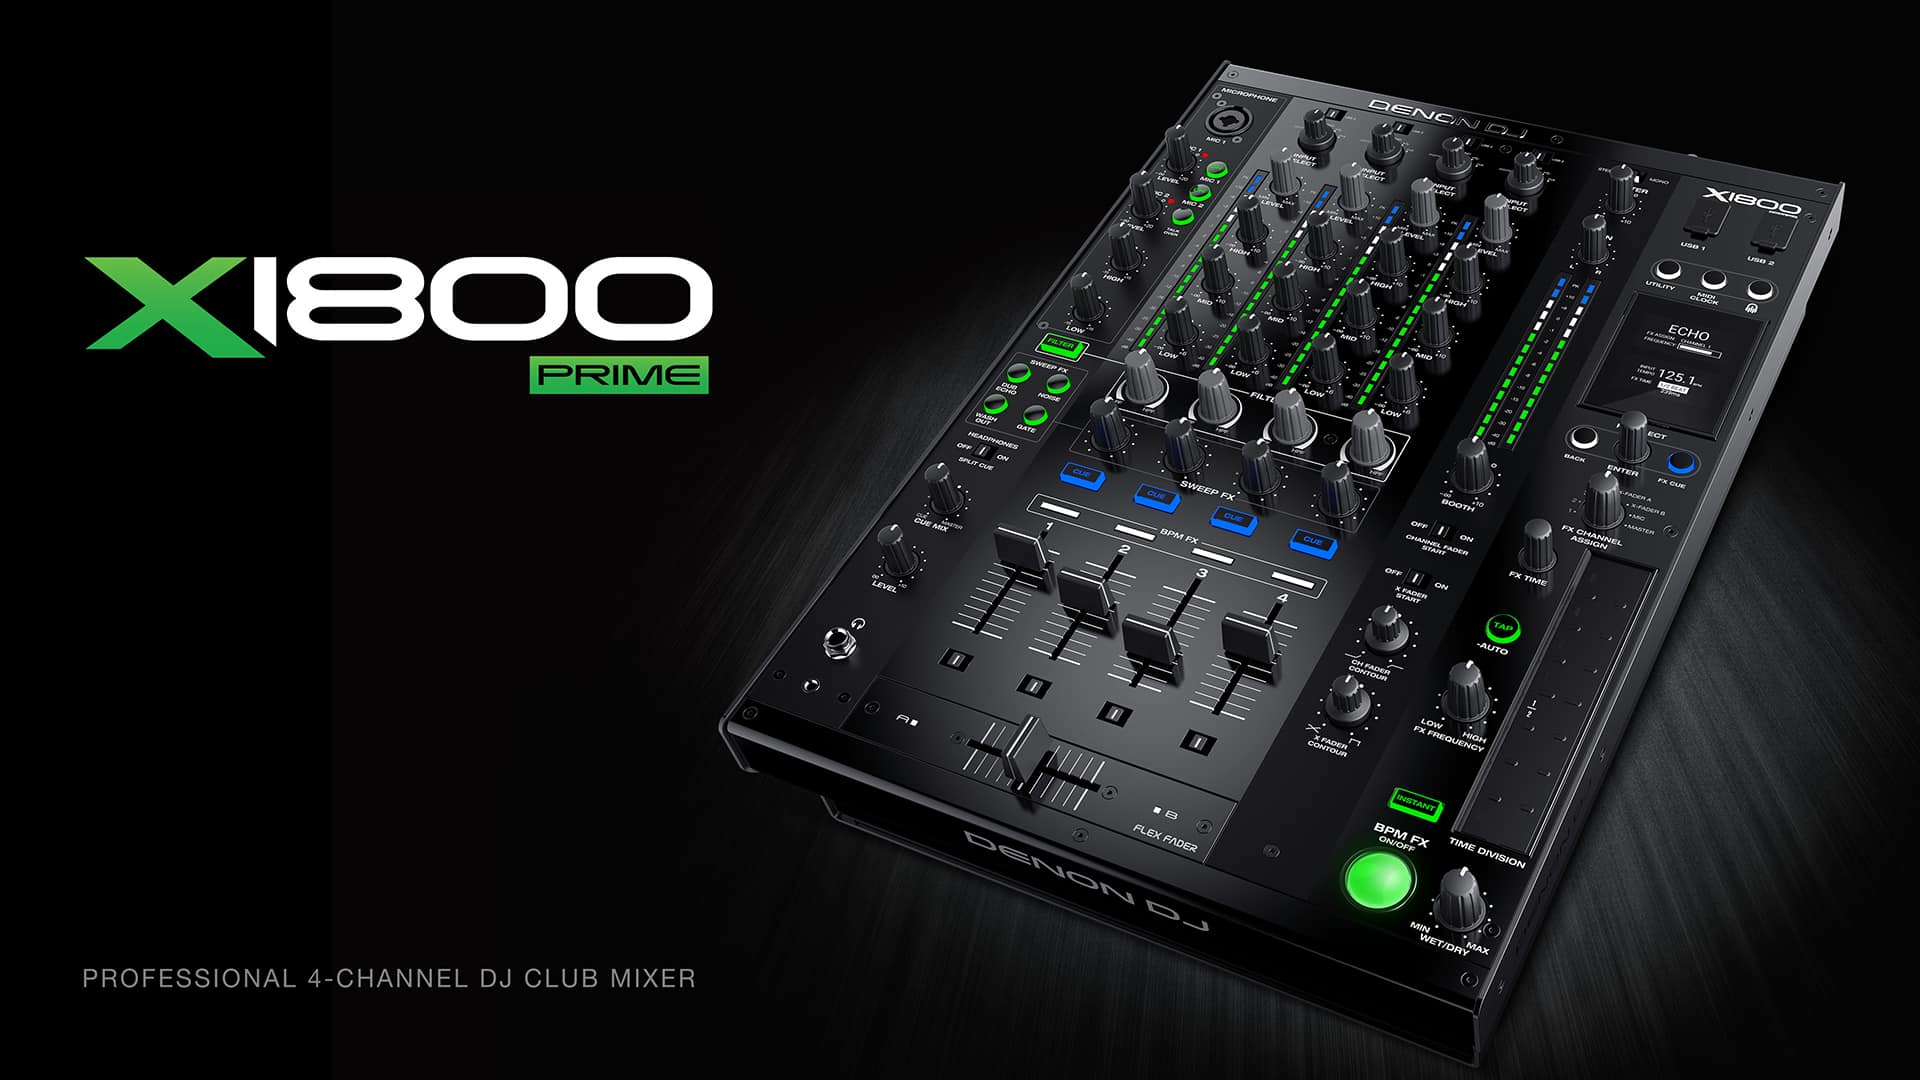 DENON DJ X1800 PRIME – PROFESSIONAL 4-CHANNEL DJ CLUB MIXER